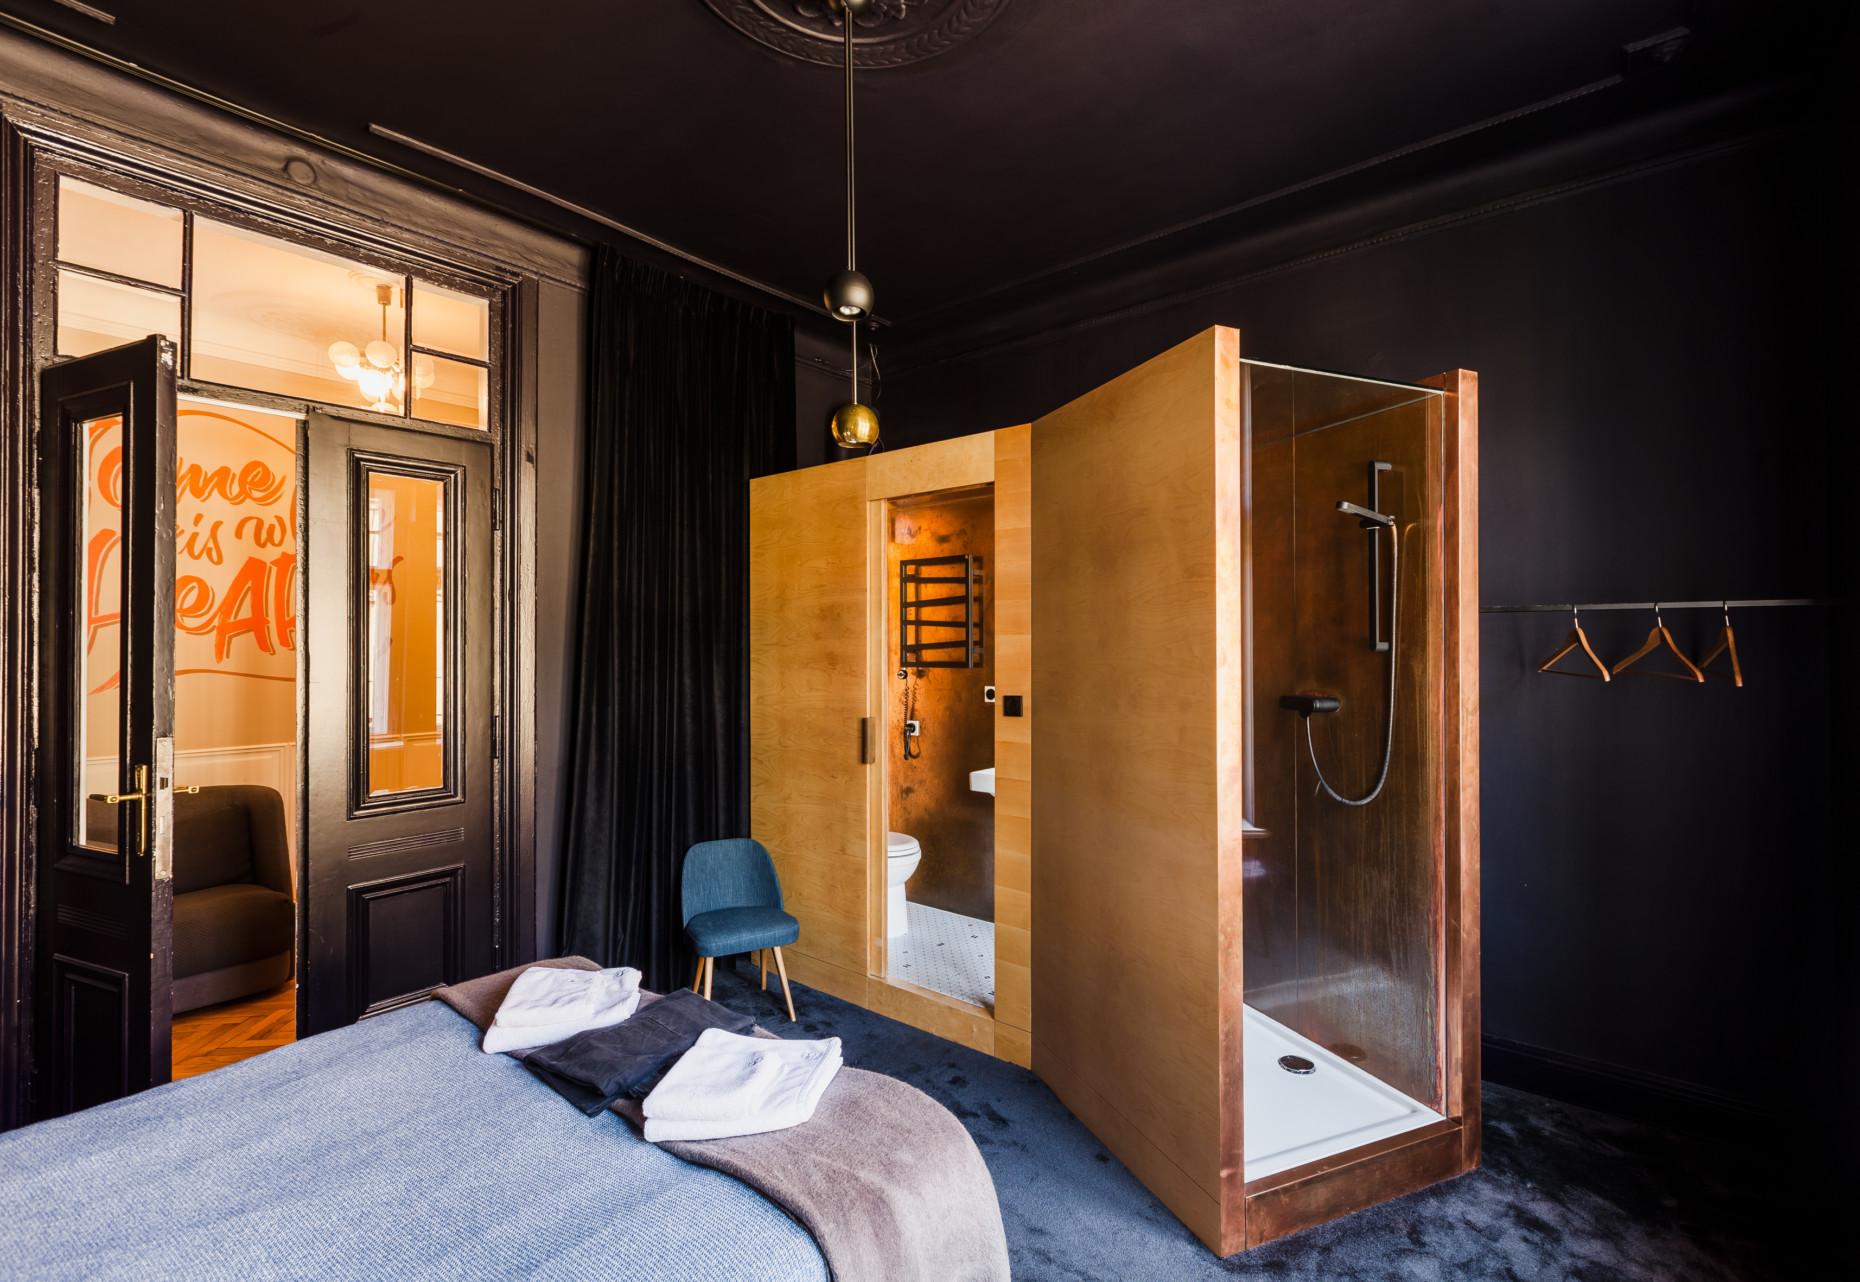 Stylepark Made A Flying Visit To Polands Design Scene